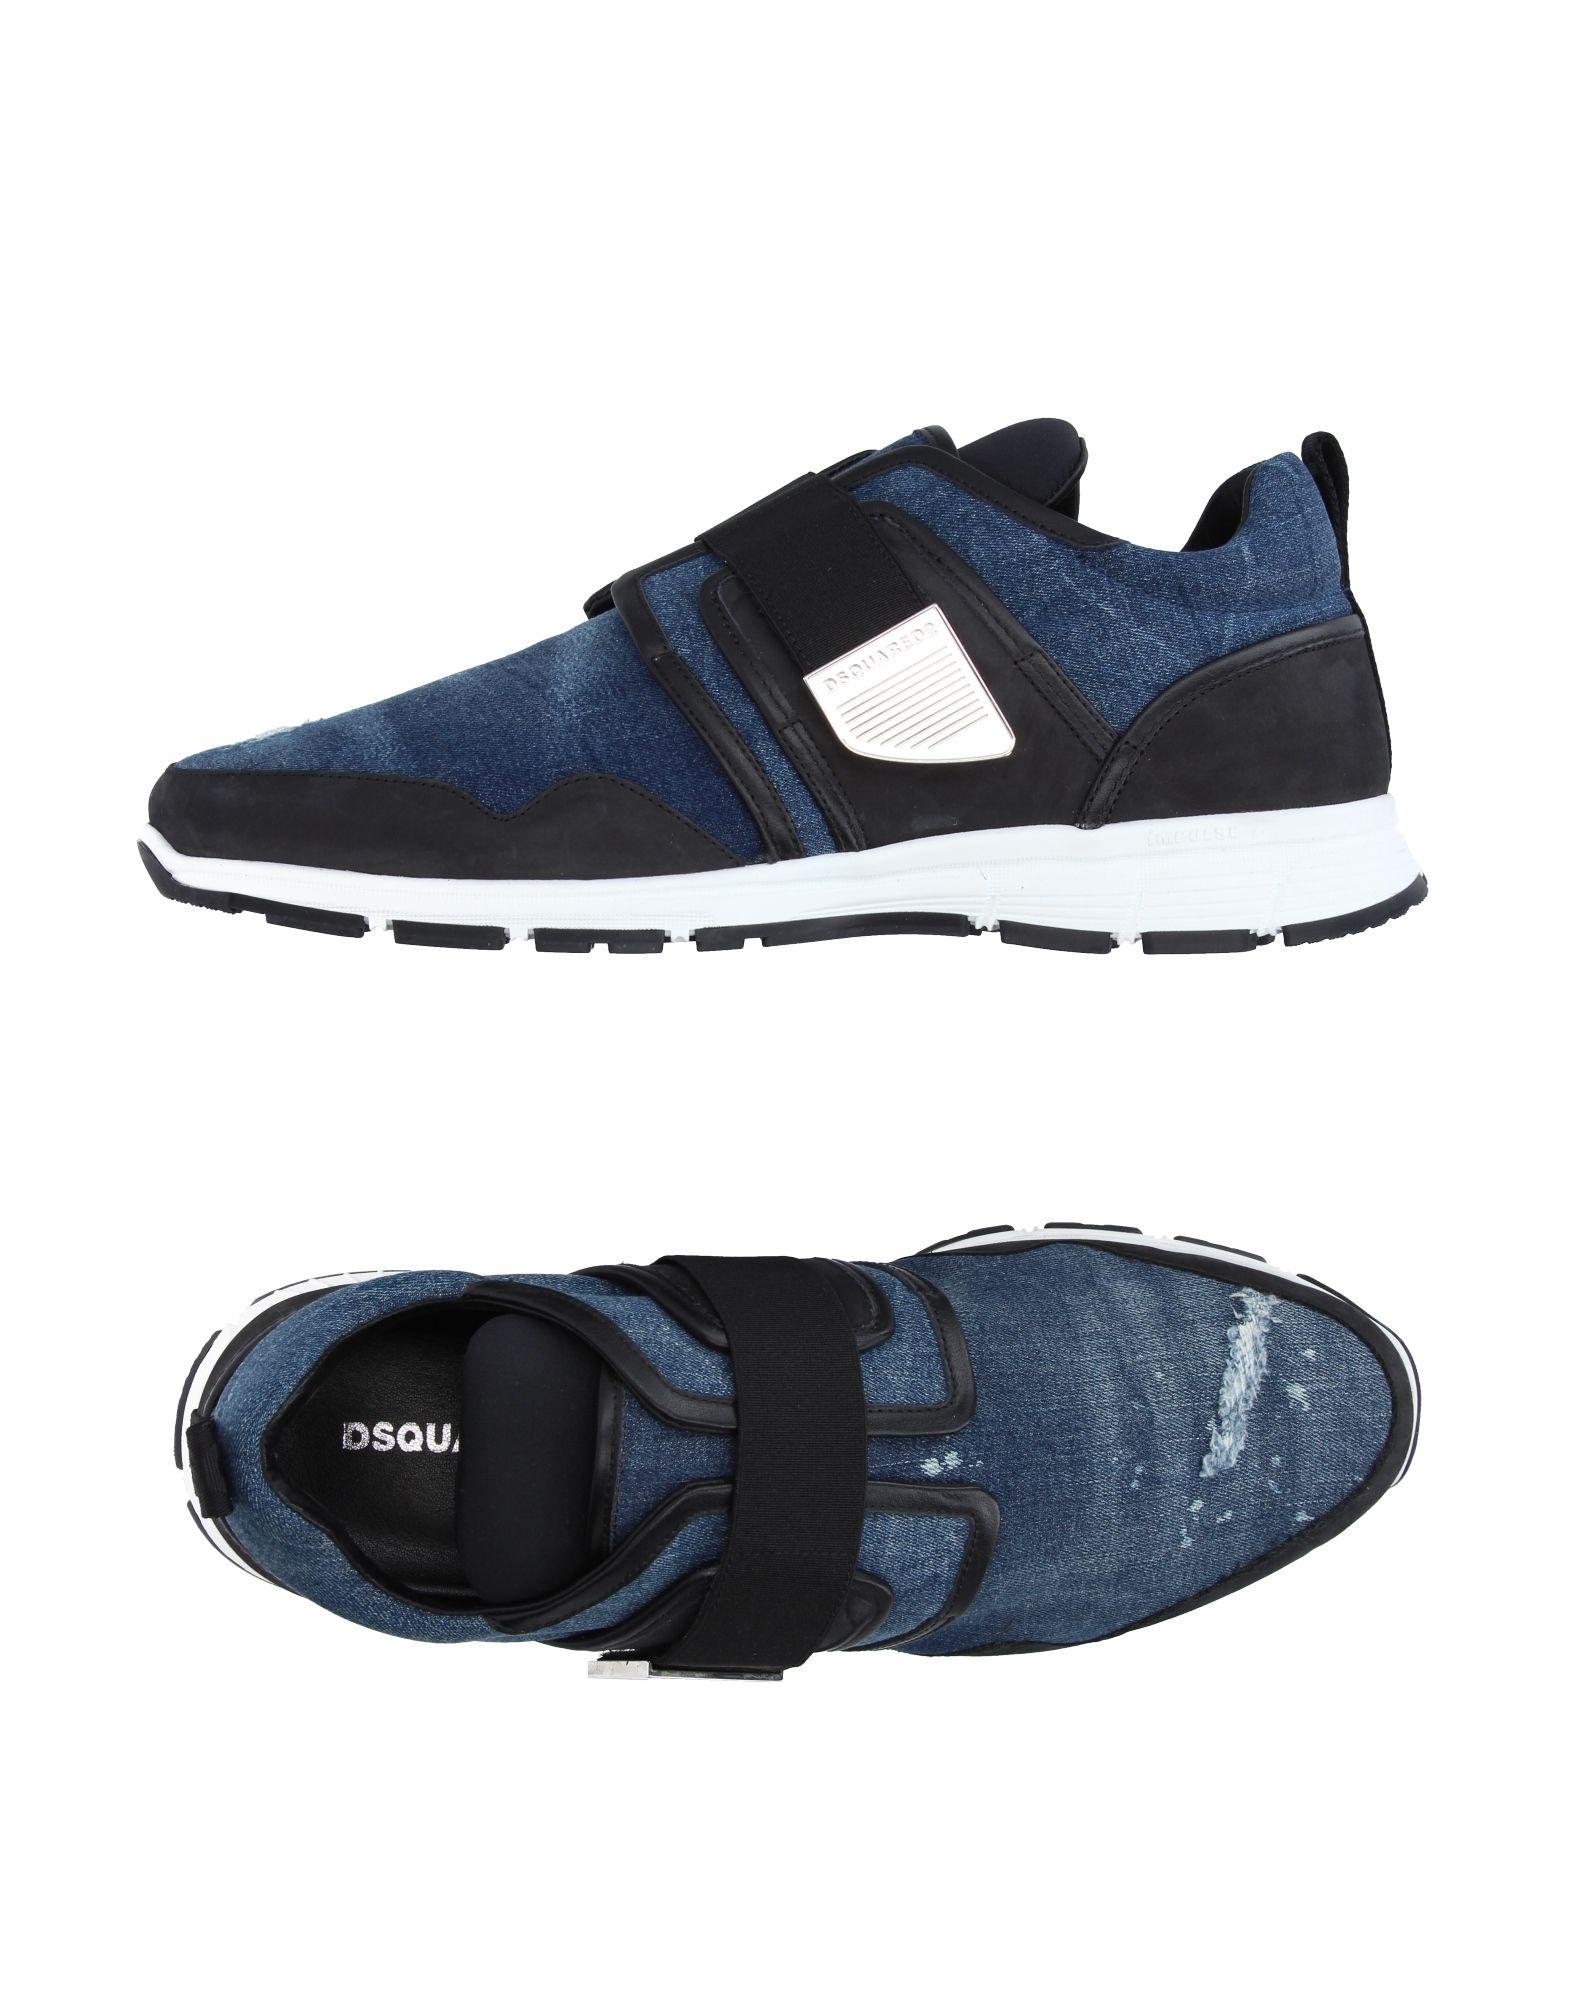 Dsquared2 Sneakers Herren Qualität  11213000MA Gute Qualität Herren beliebte Schuhe 5ed2d4